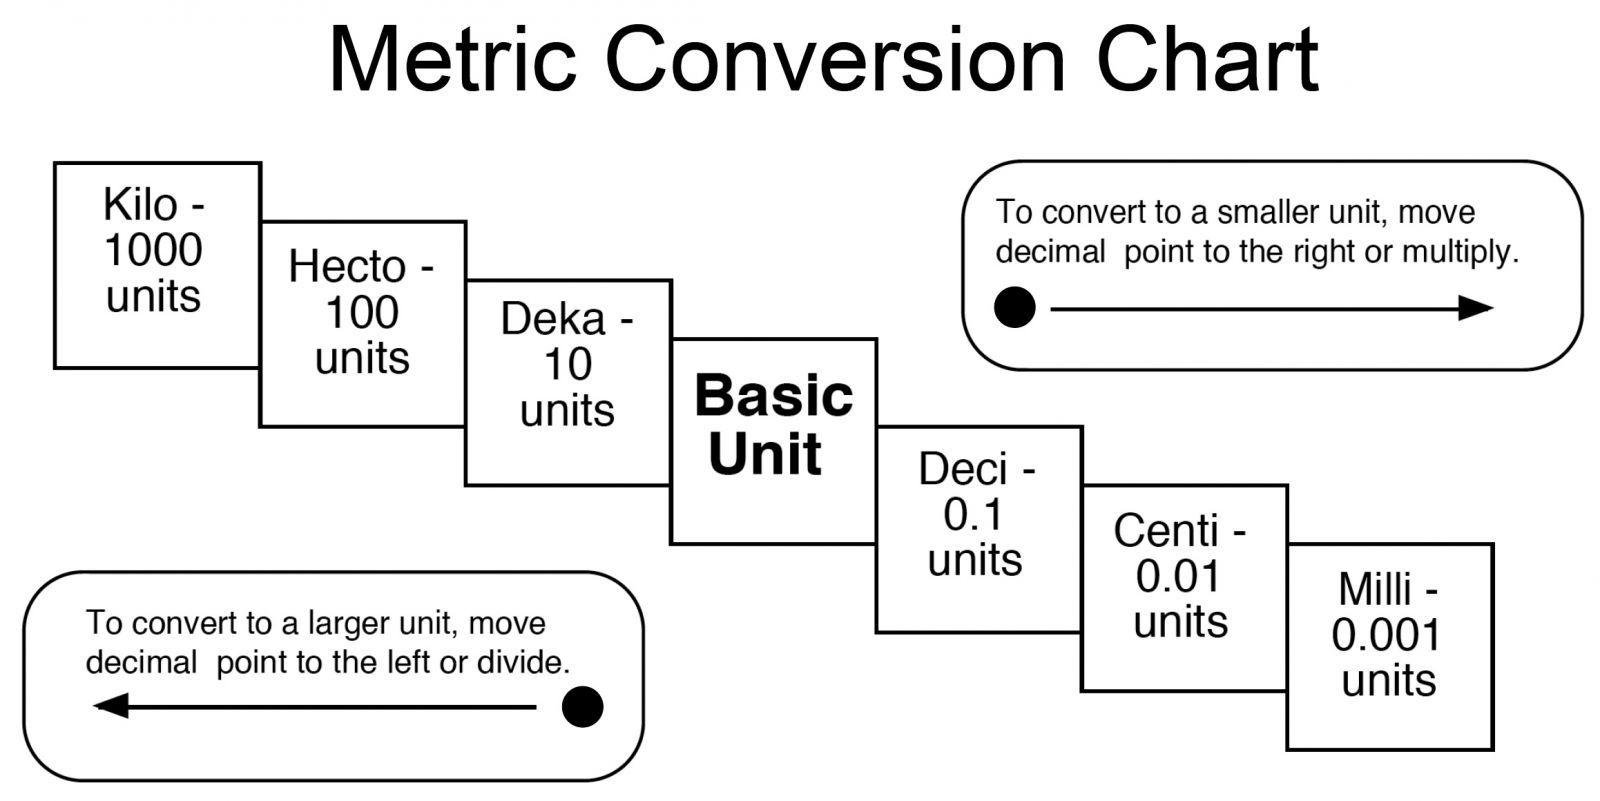 Metric system metric conversions quiz 5th grade math graphic organizers falaconquin